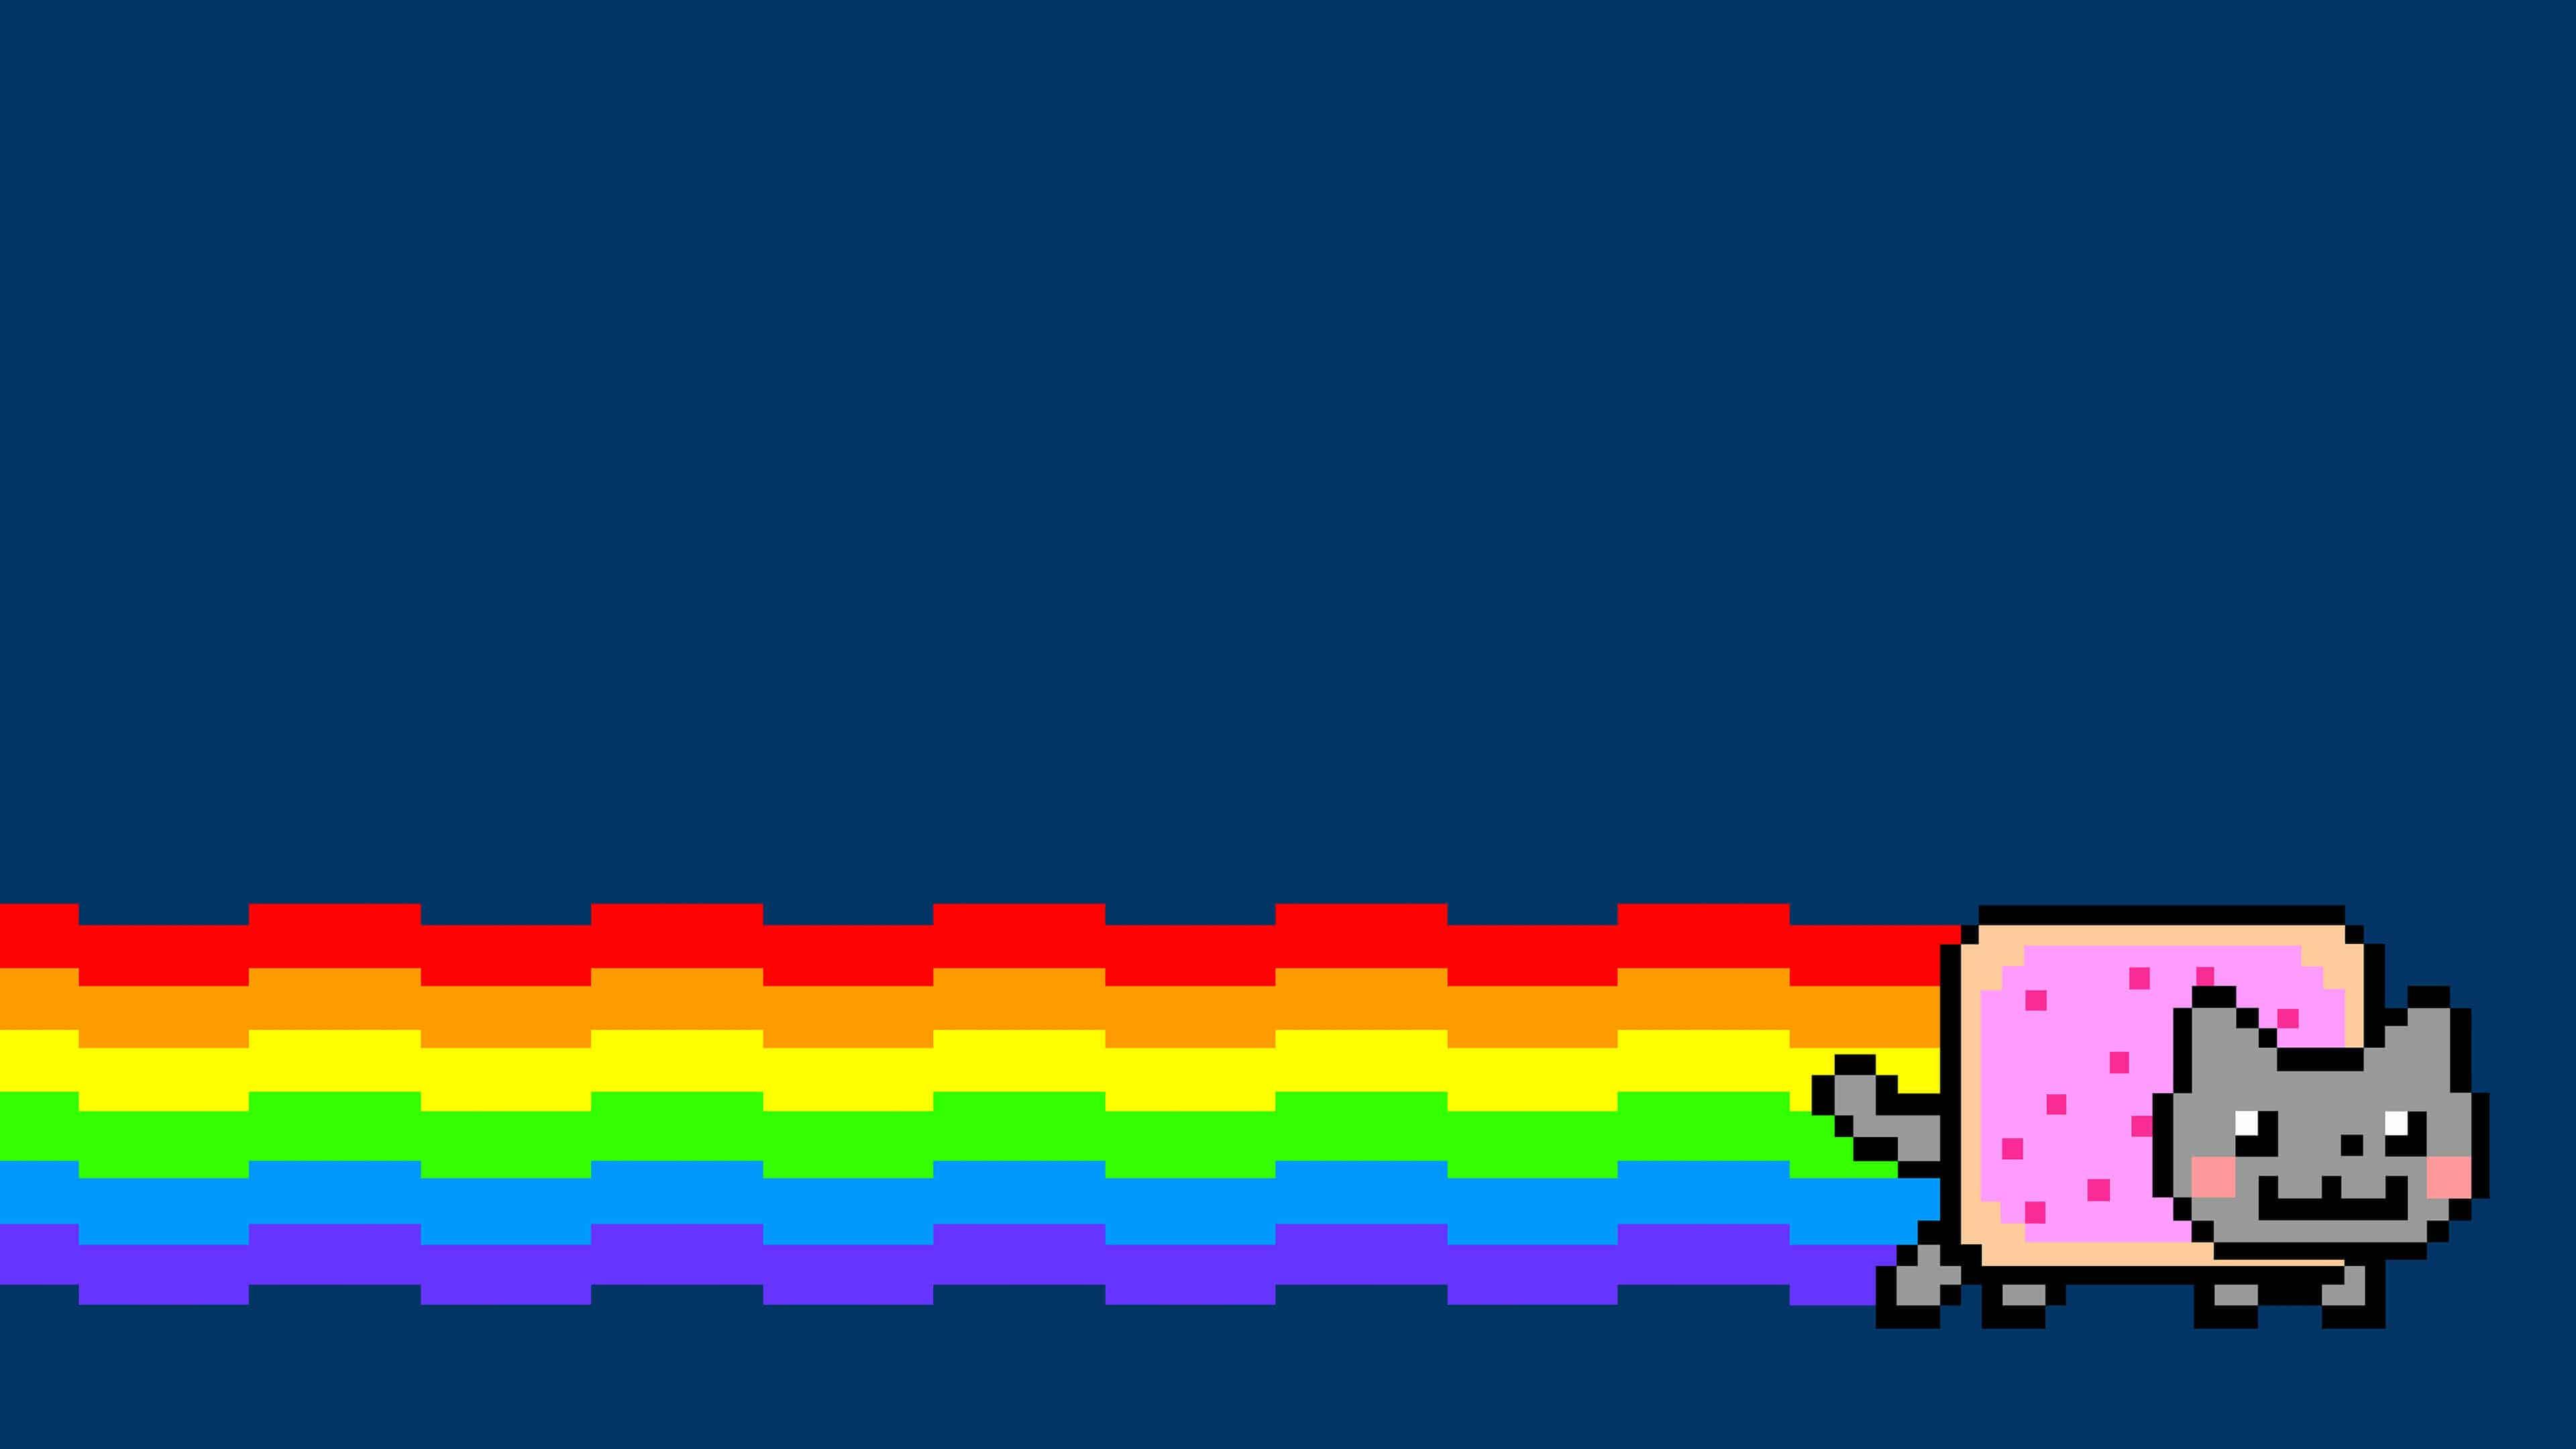 Nyan Cat UHD 4K Wallpaper